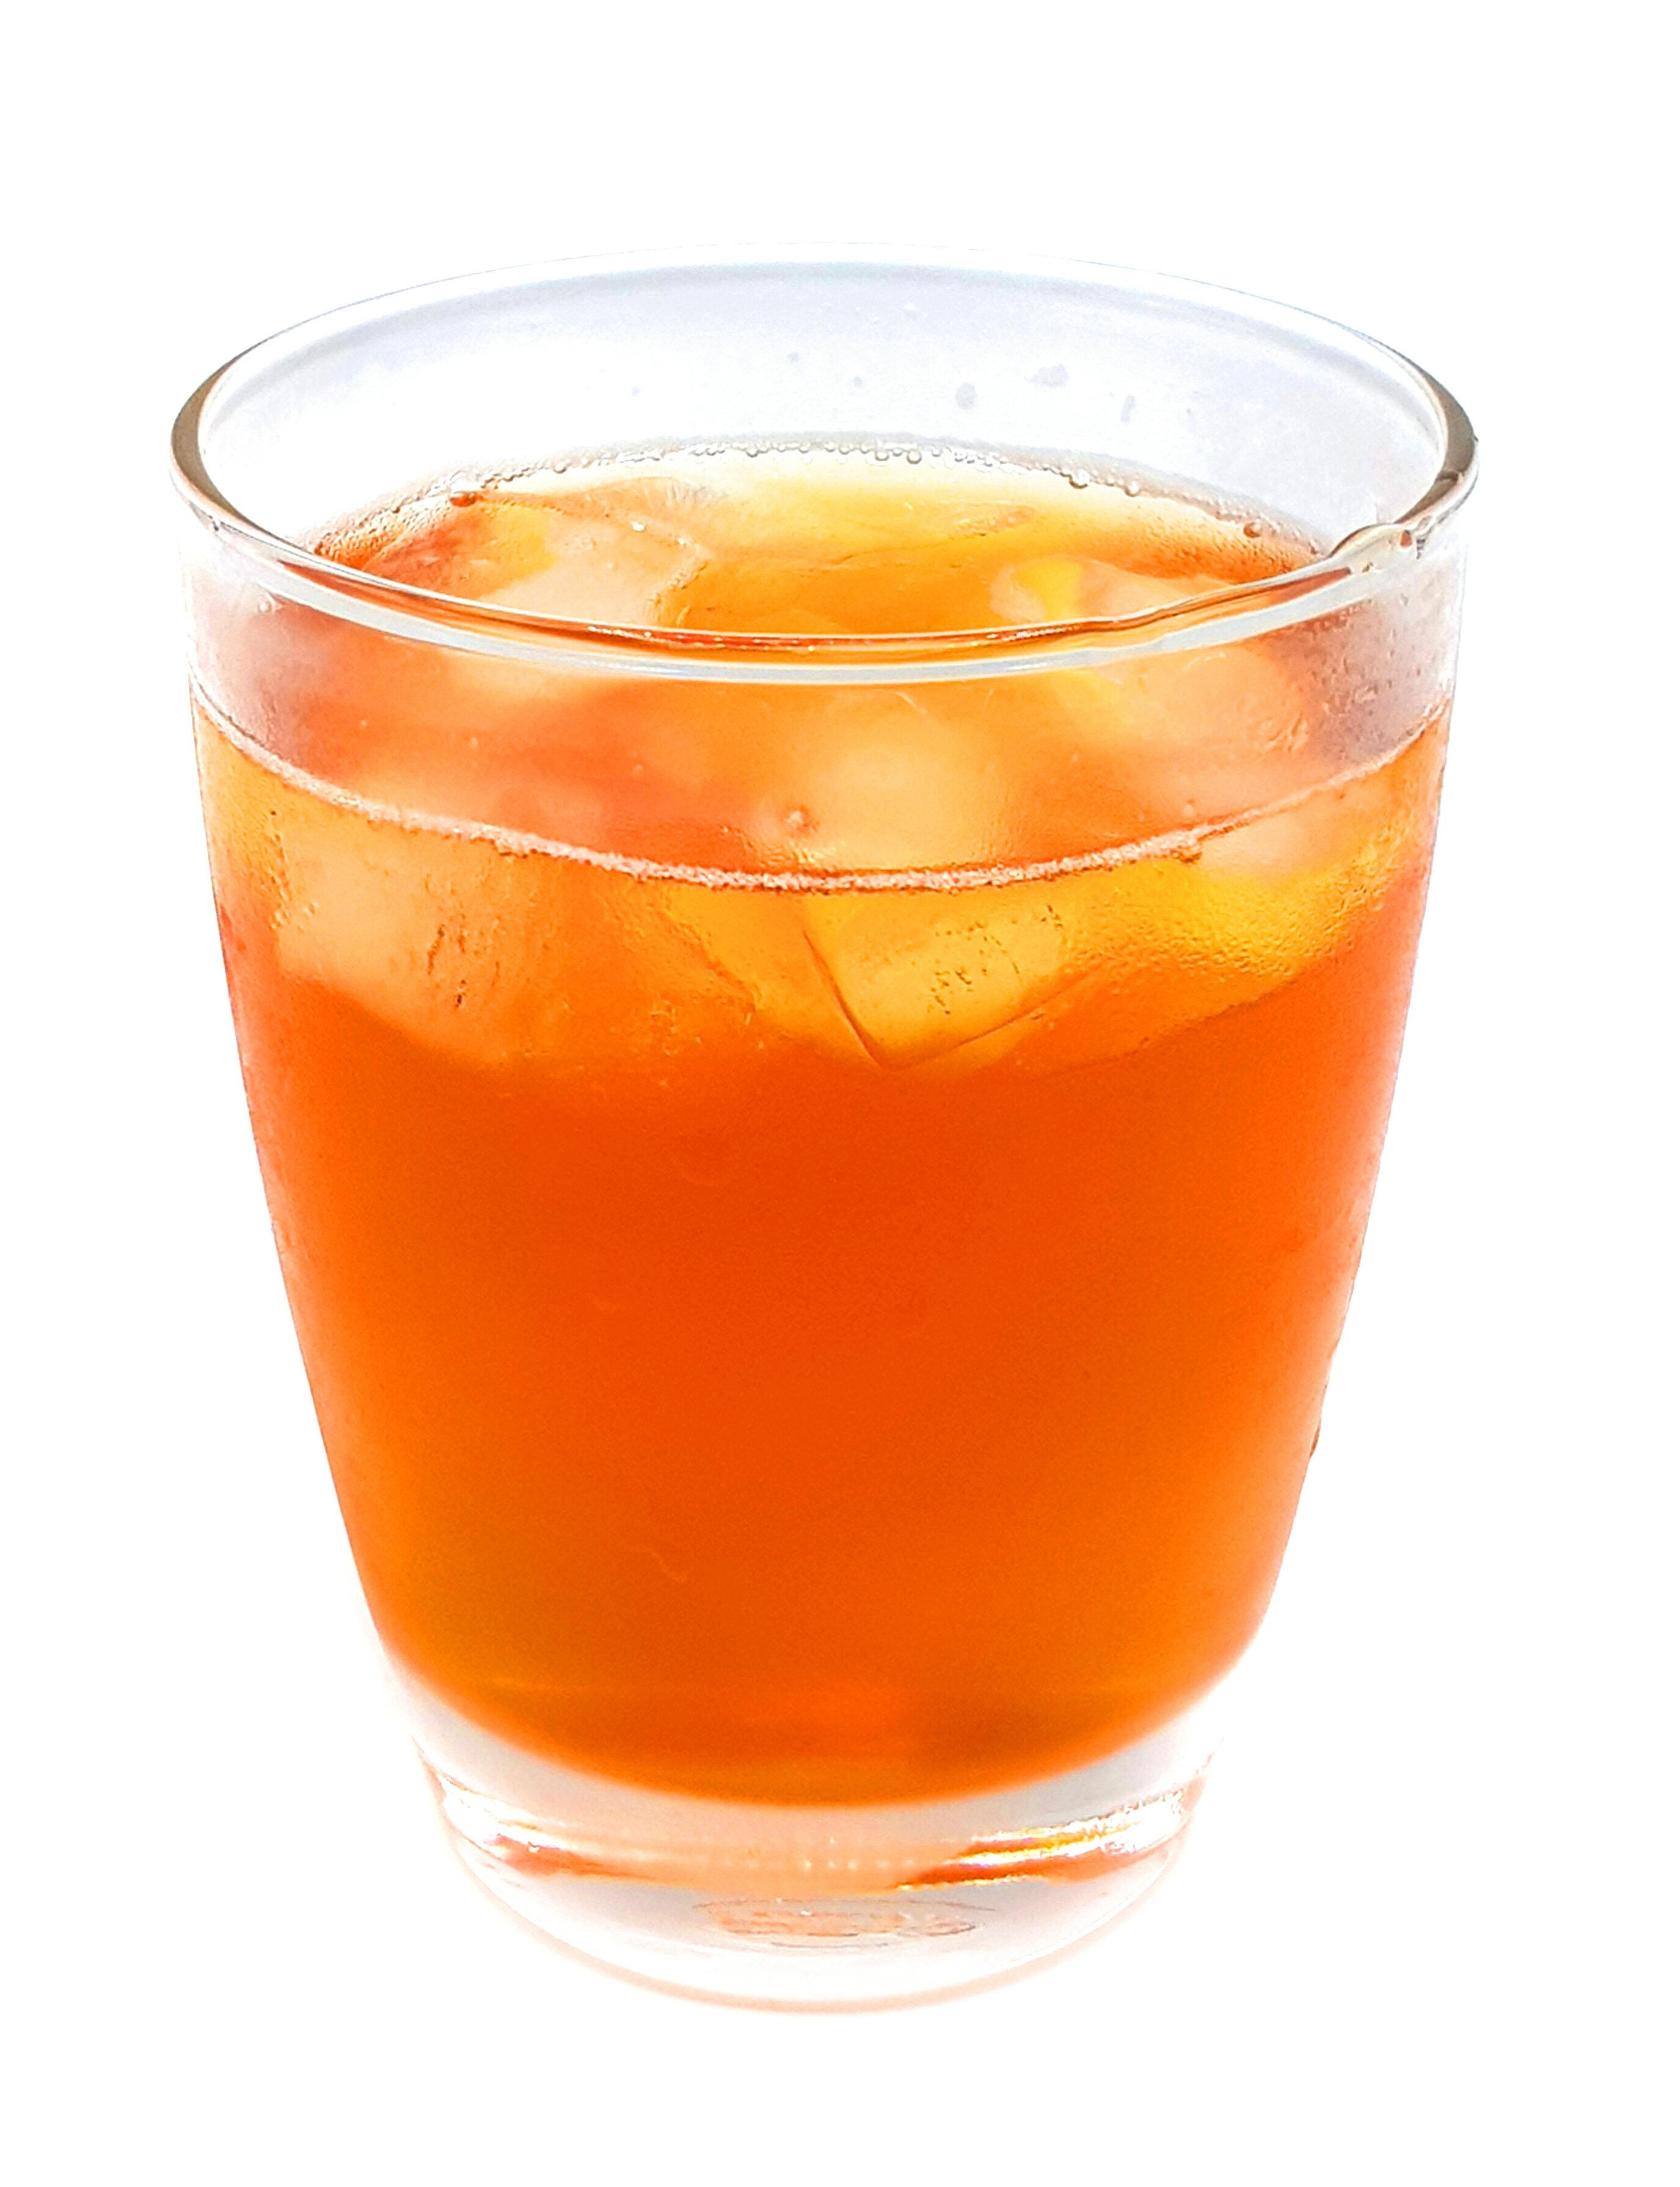 《Chara 微百貨》日東 紅茶 豆香 拿鐵 萊姆 皇家奶茶 片岡 伯爵 奶茶 抹茶 twinings 歐蕾 宇治 3